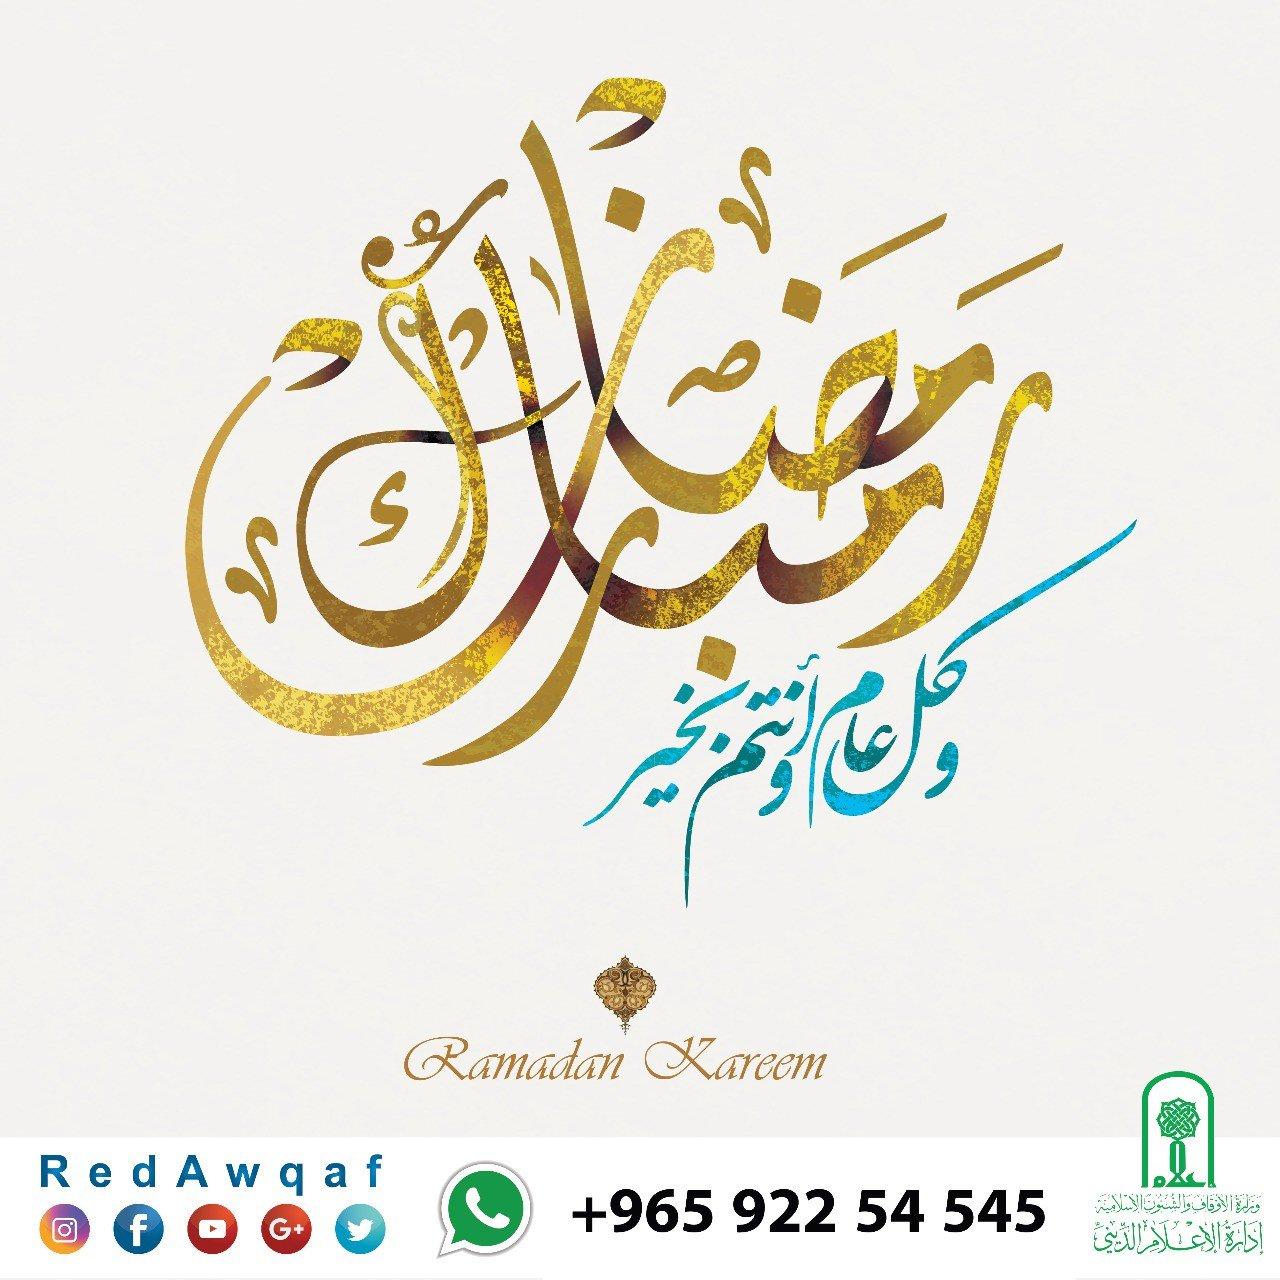 salahabaalkhail_2017-May-27.jpg